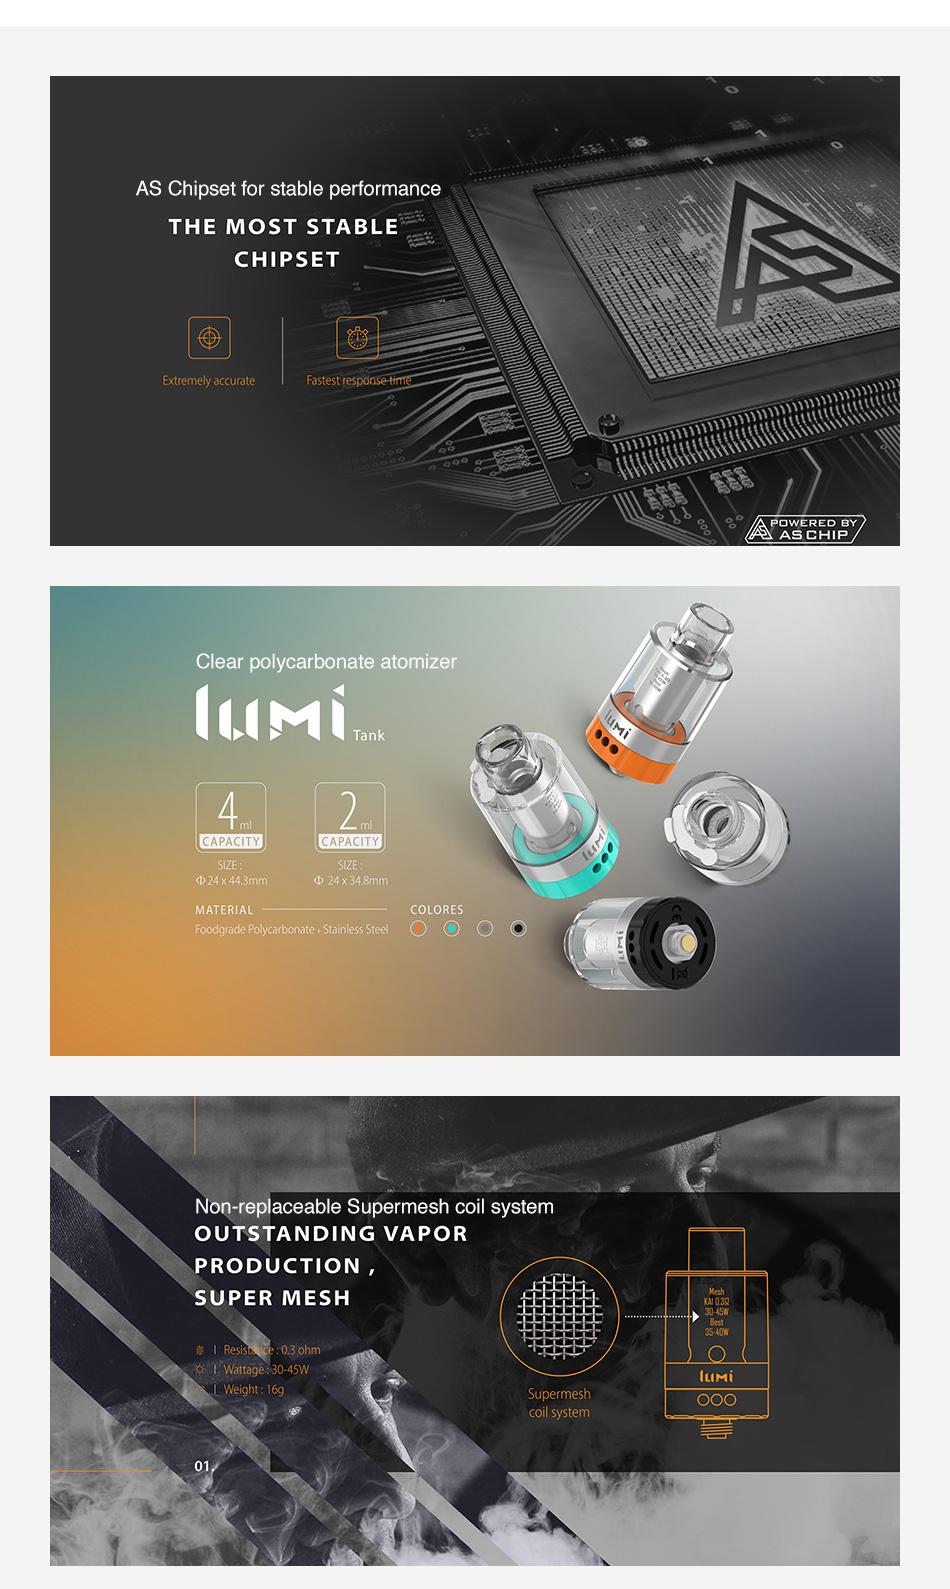 , Digiflavor Helix Starter Kit w/ 4ml Lumi Tank & AS Chipset & Non-replaceable Supermesh Coil System No 18650 Battery Vape Pen Kit